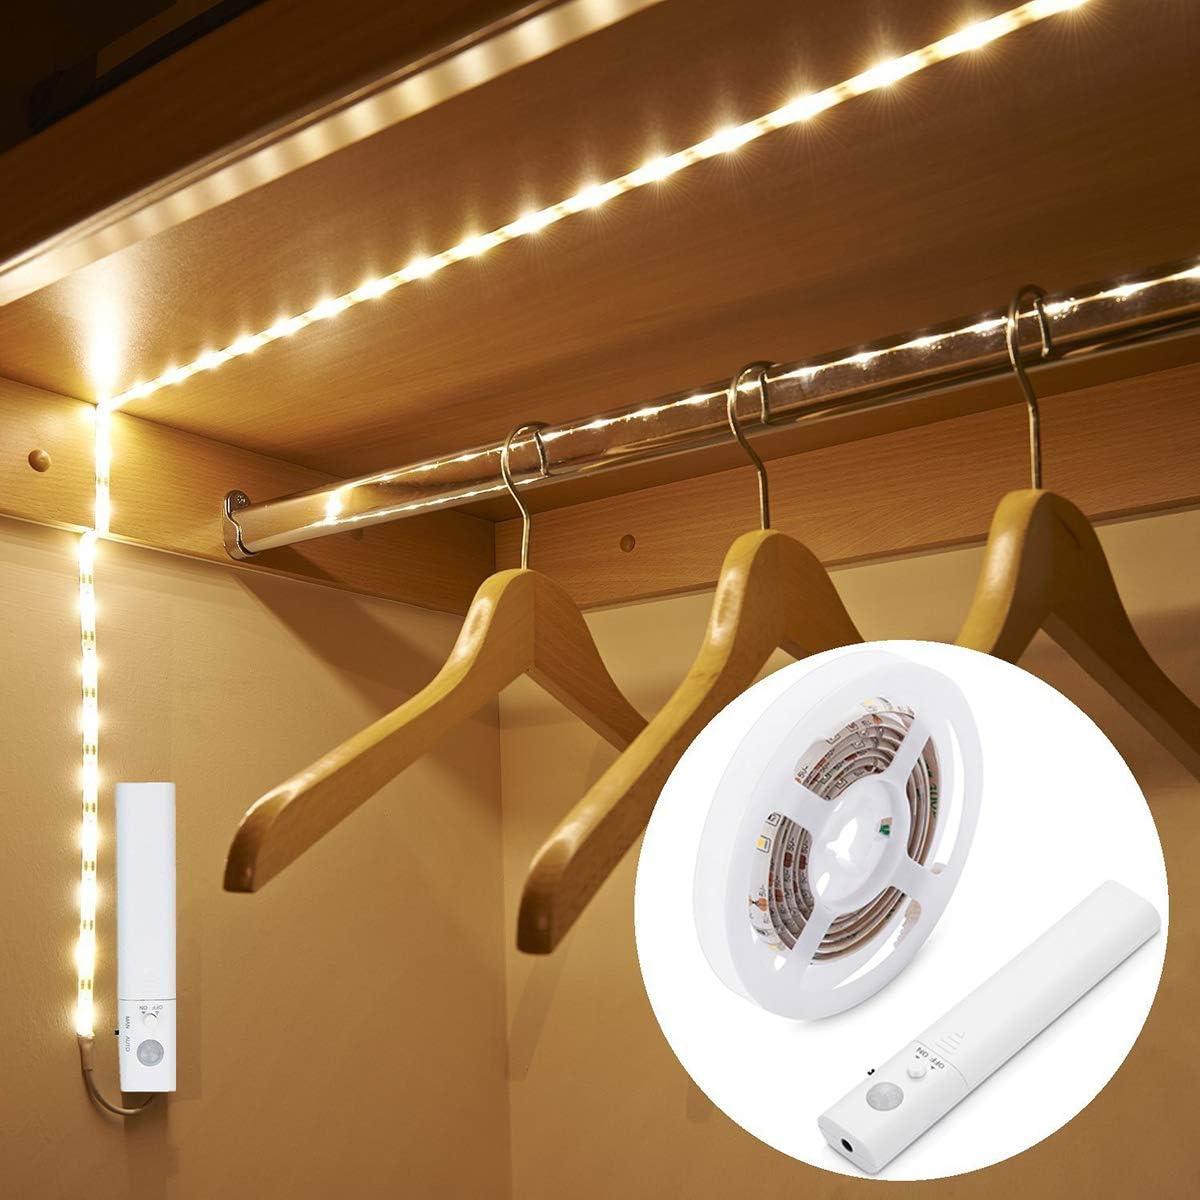 QTQHOME Led Dual Mode Motion Excellence Night Str Flexible Super popular specialty store Light Sensor